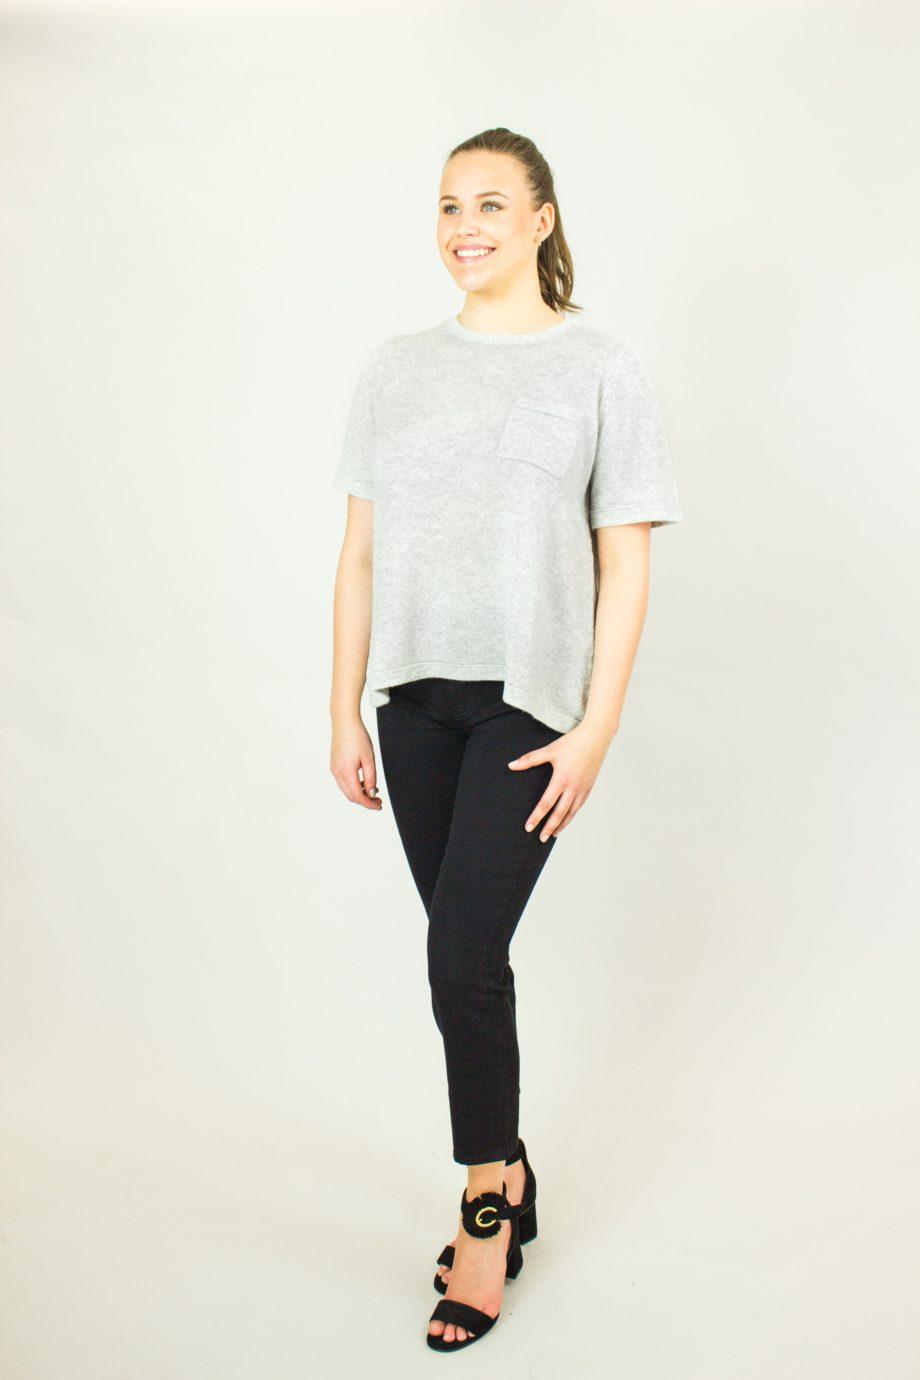 26. FTC Grey sweater